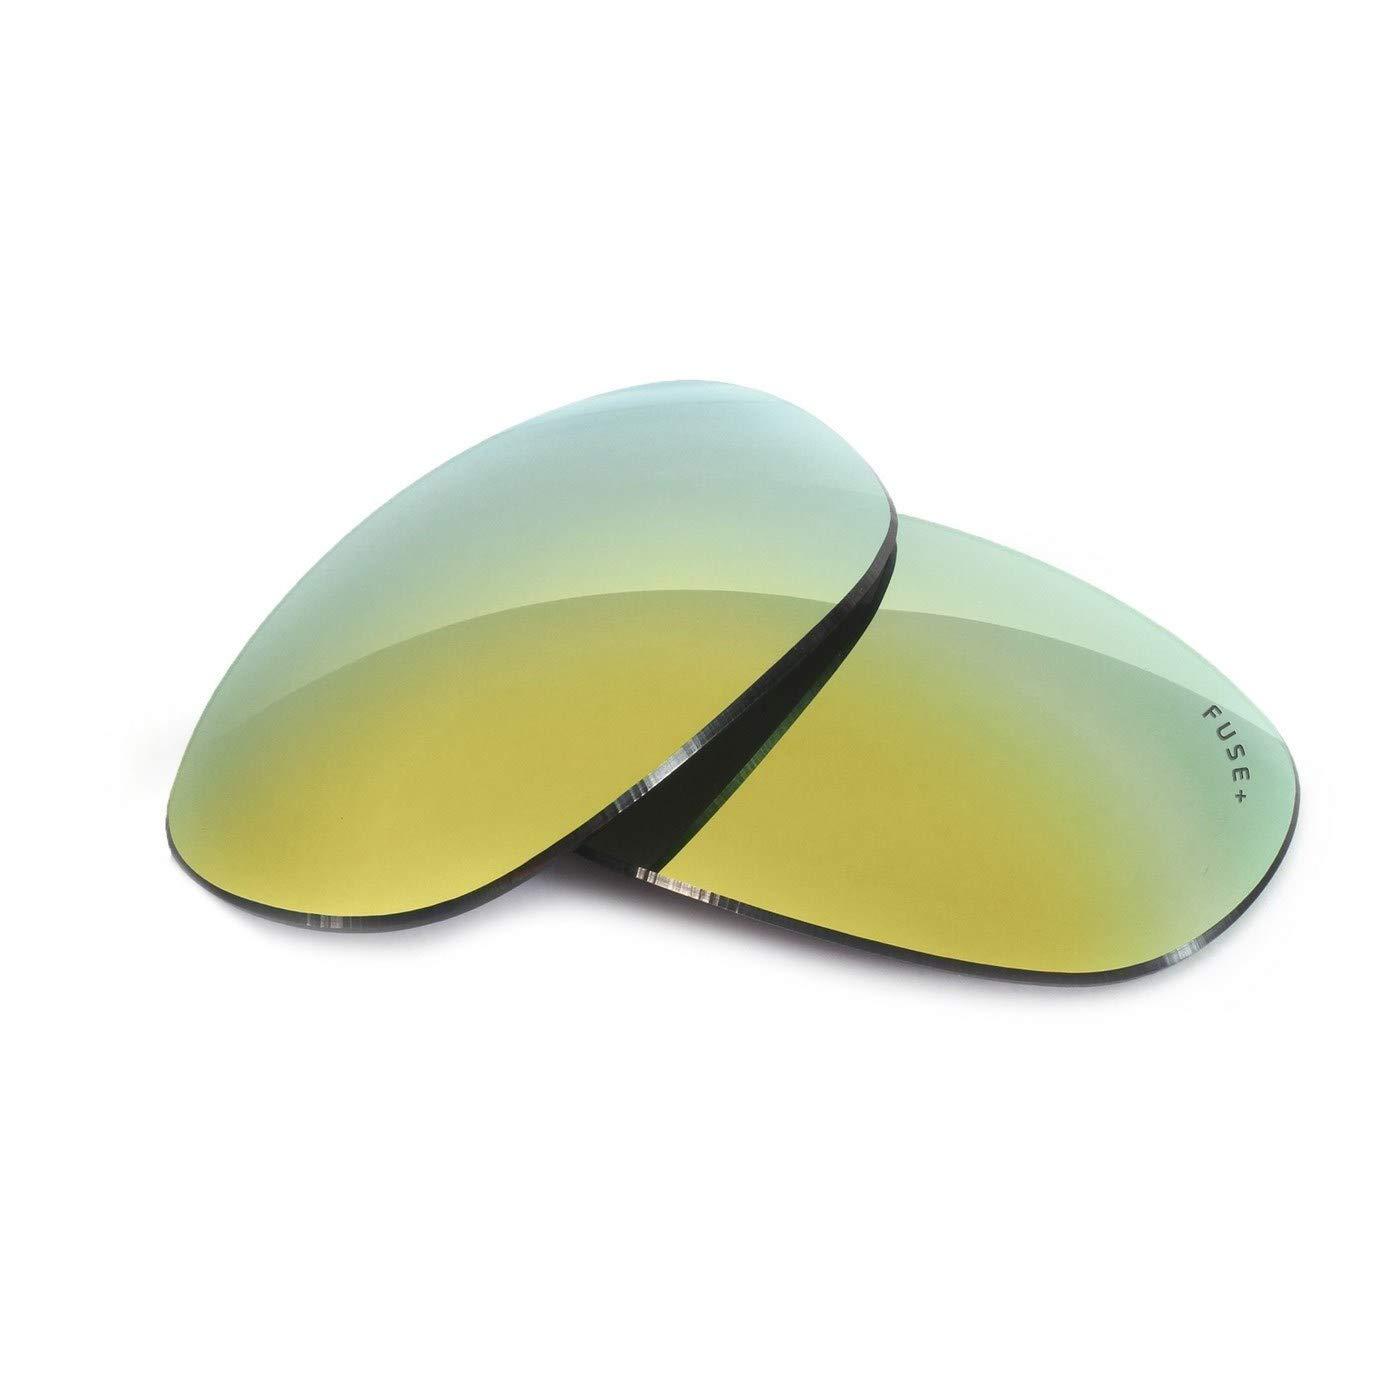 Plus Replacement Lenses for Maui Jim Harpoon MJ-161 Fuse Lenses Fuse